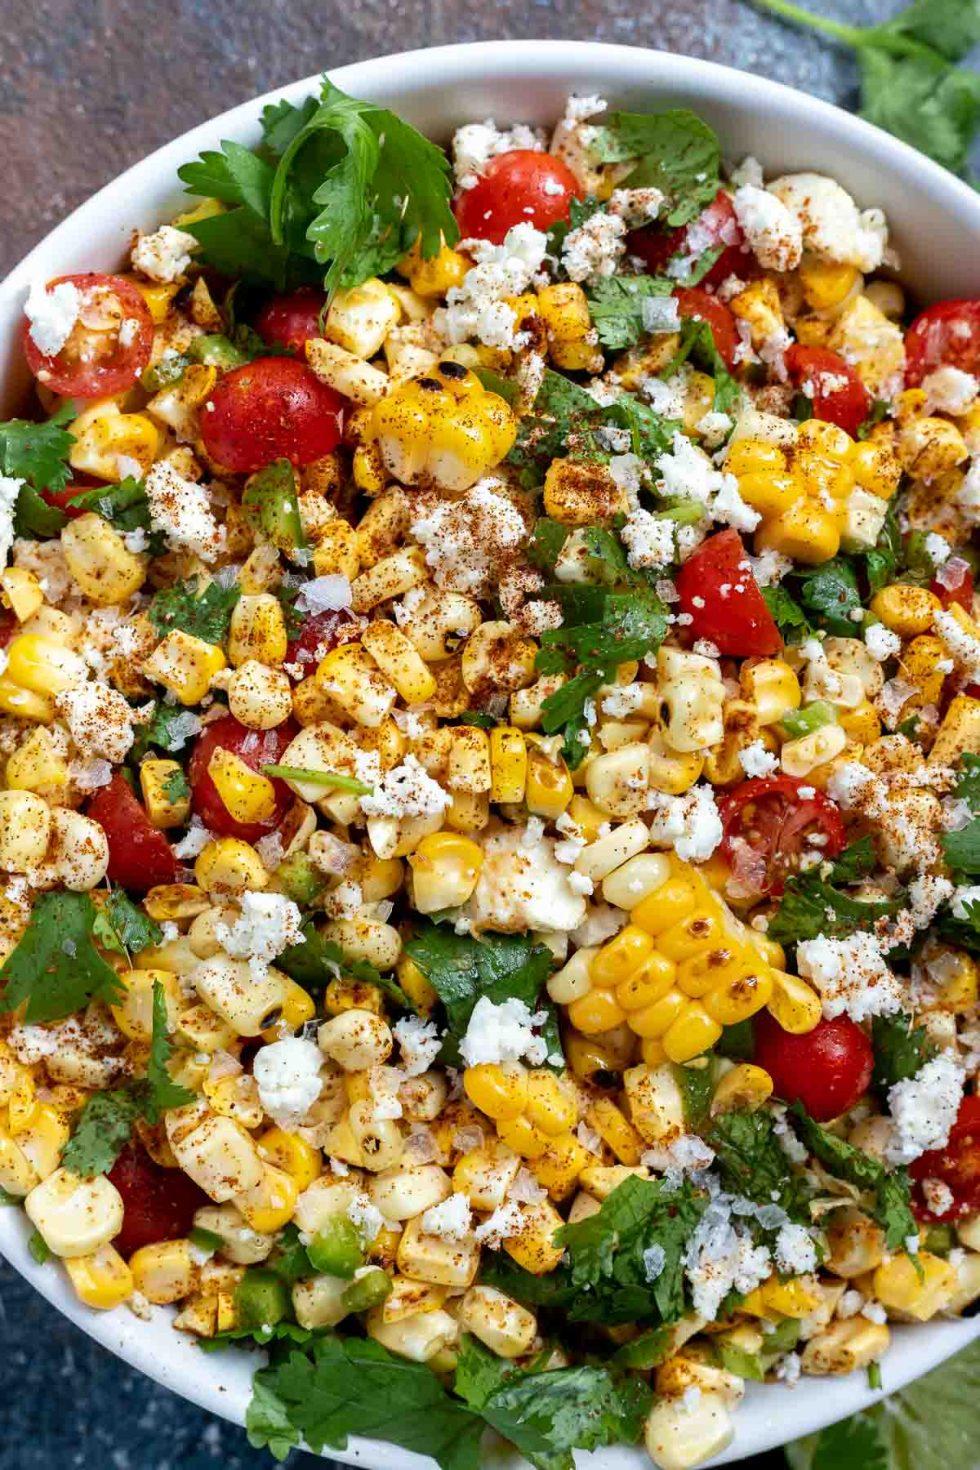 corn salad with tomatoes and fresh cilantro